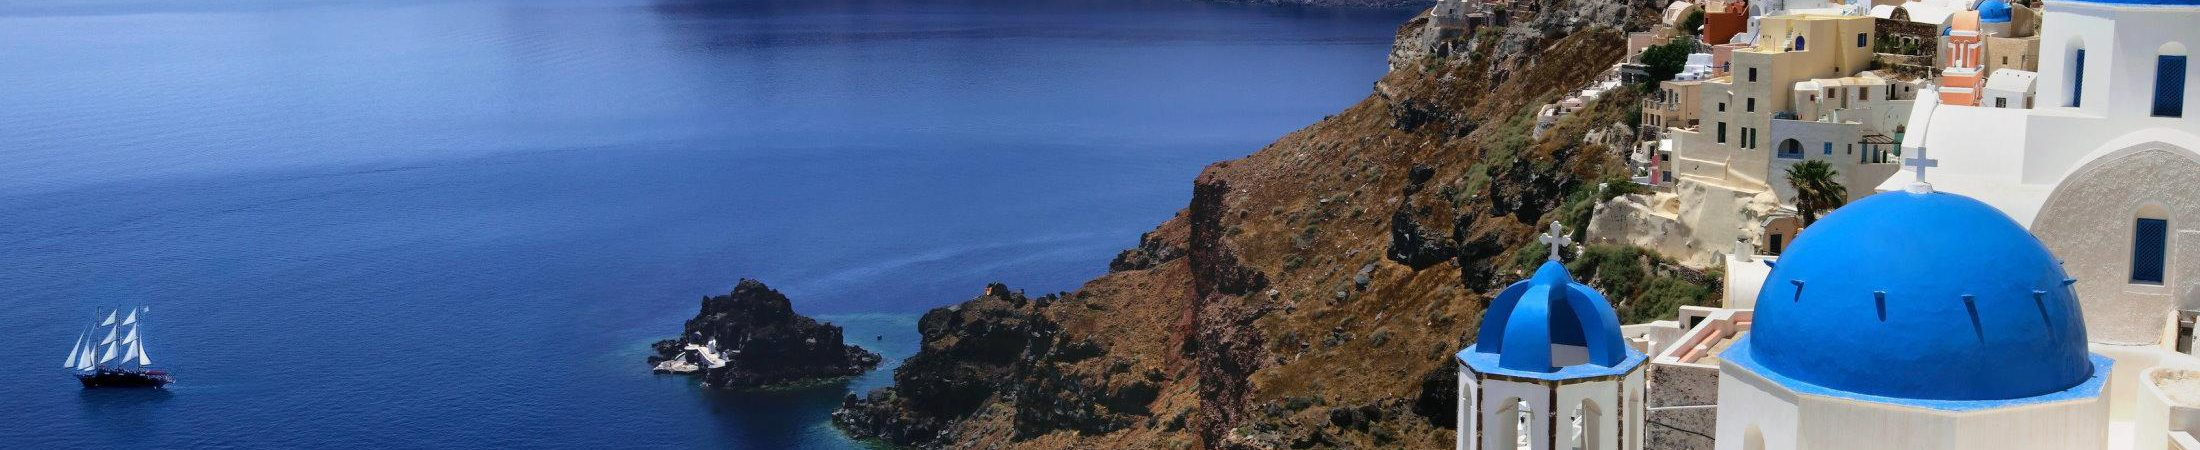 Santorini Caldera Travel